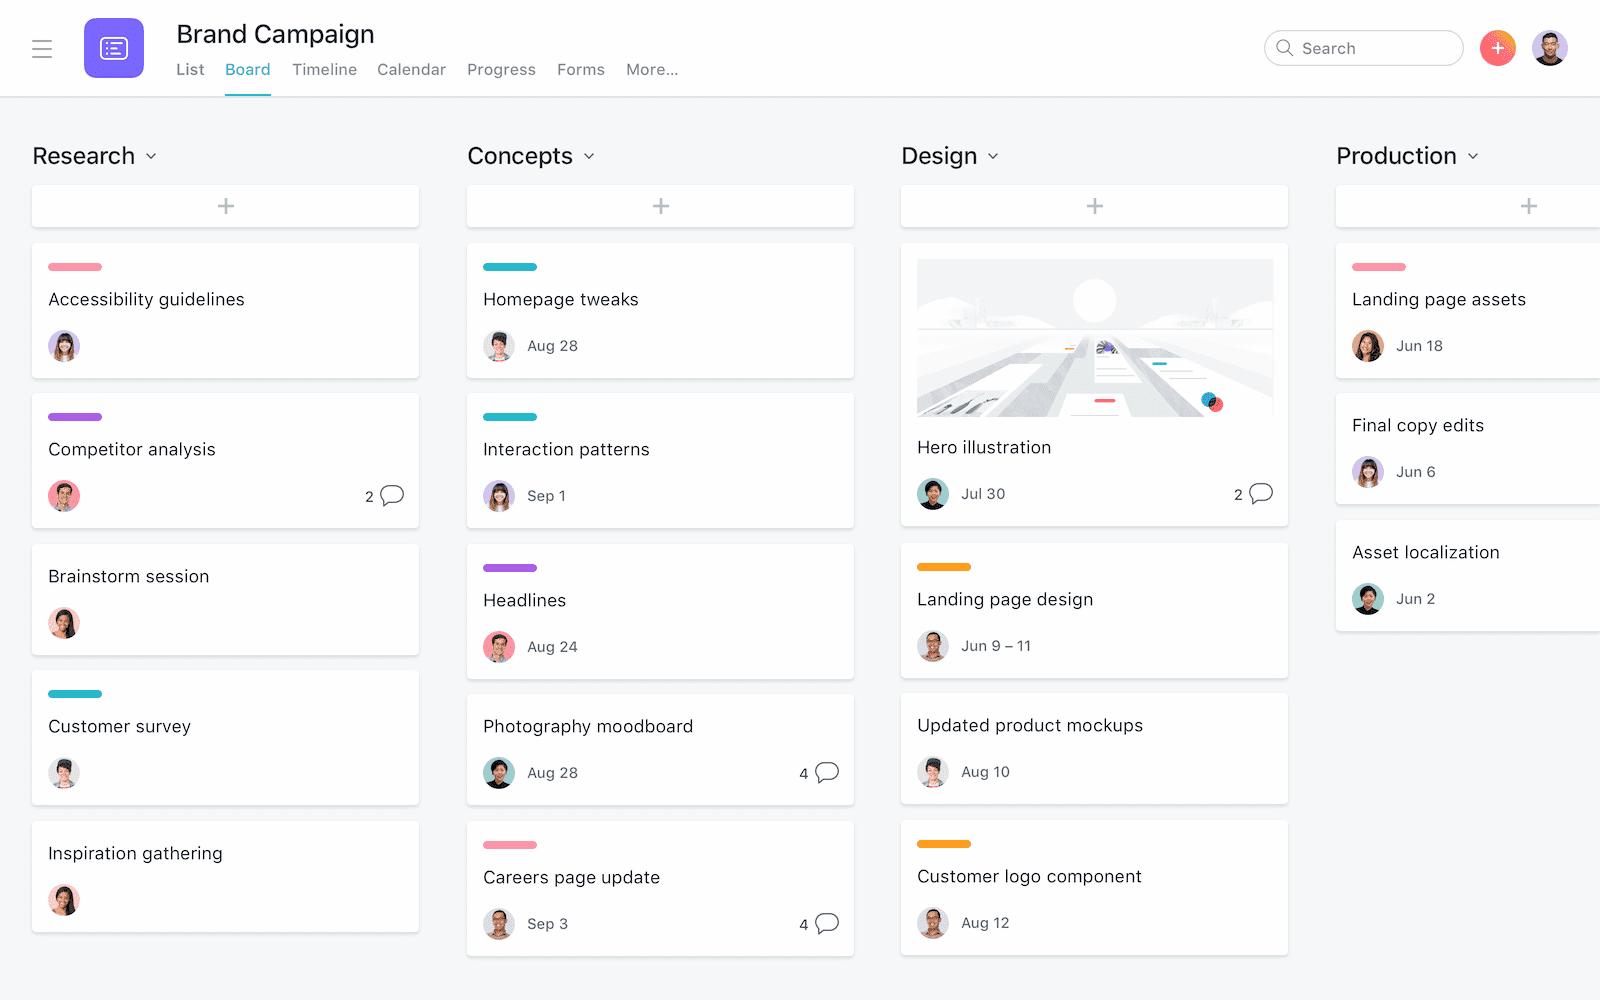 Project Management Skills - Using Kanban Boards